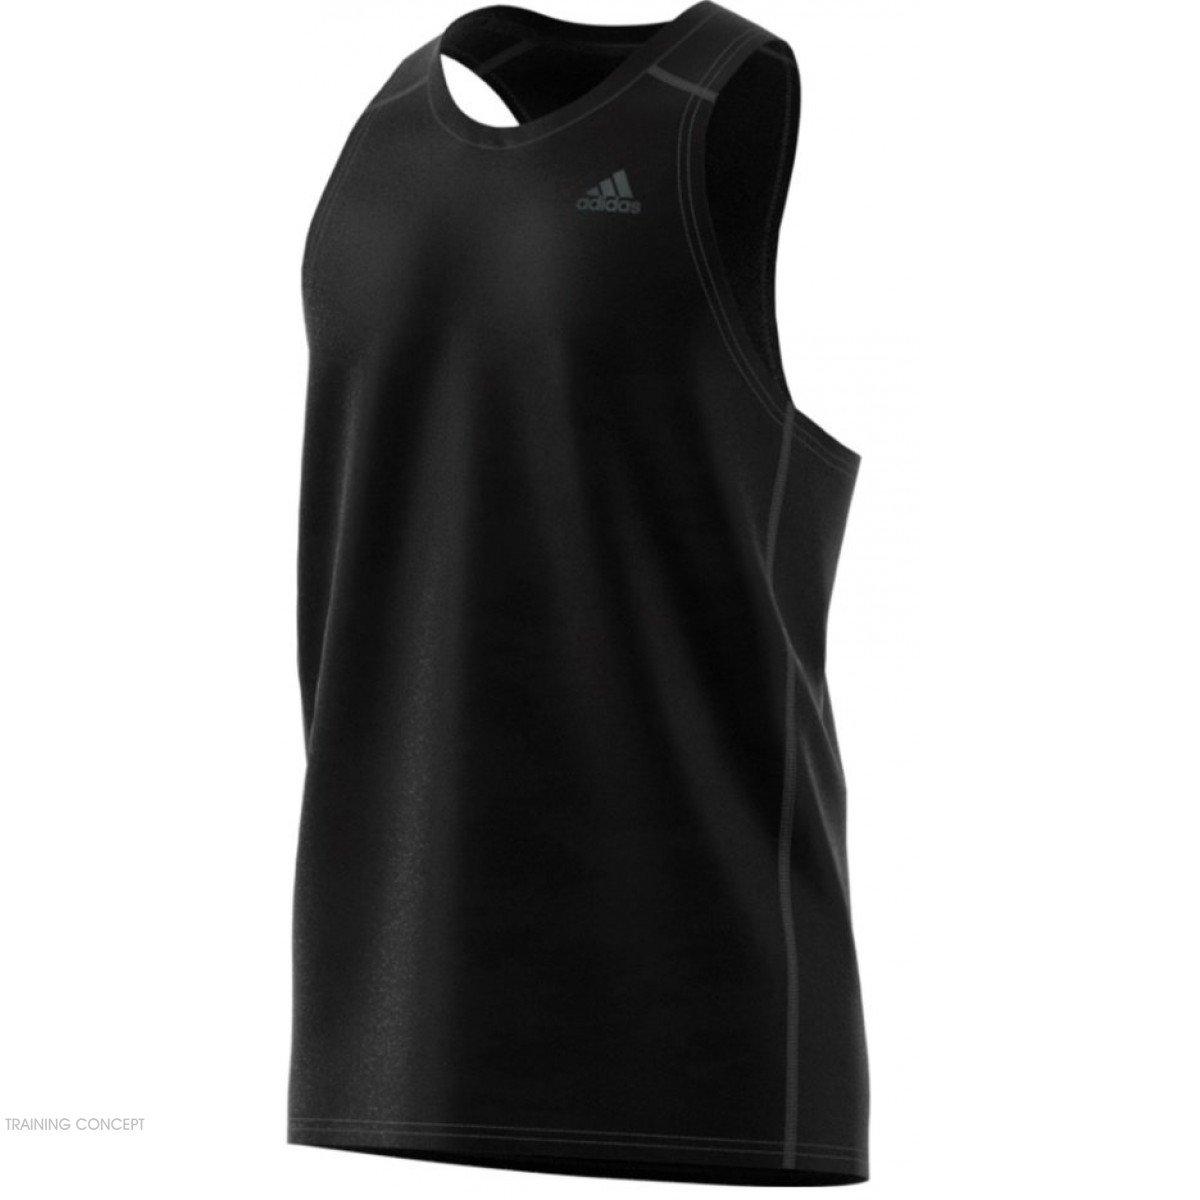 De Hommes Adidas Pour Response Ce7279 Débardeur Debardeur Running XZPuOki